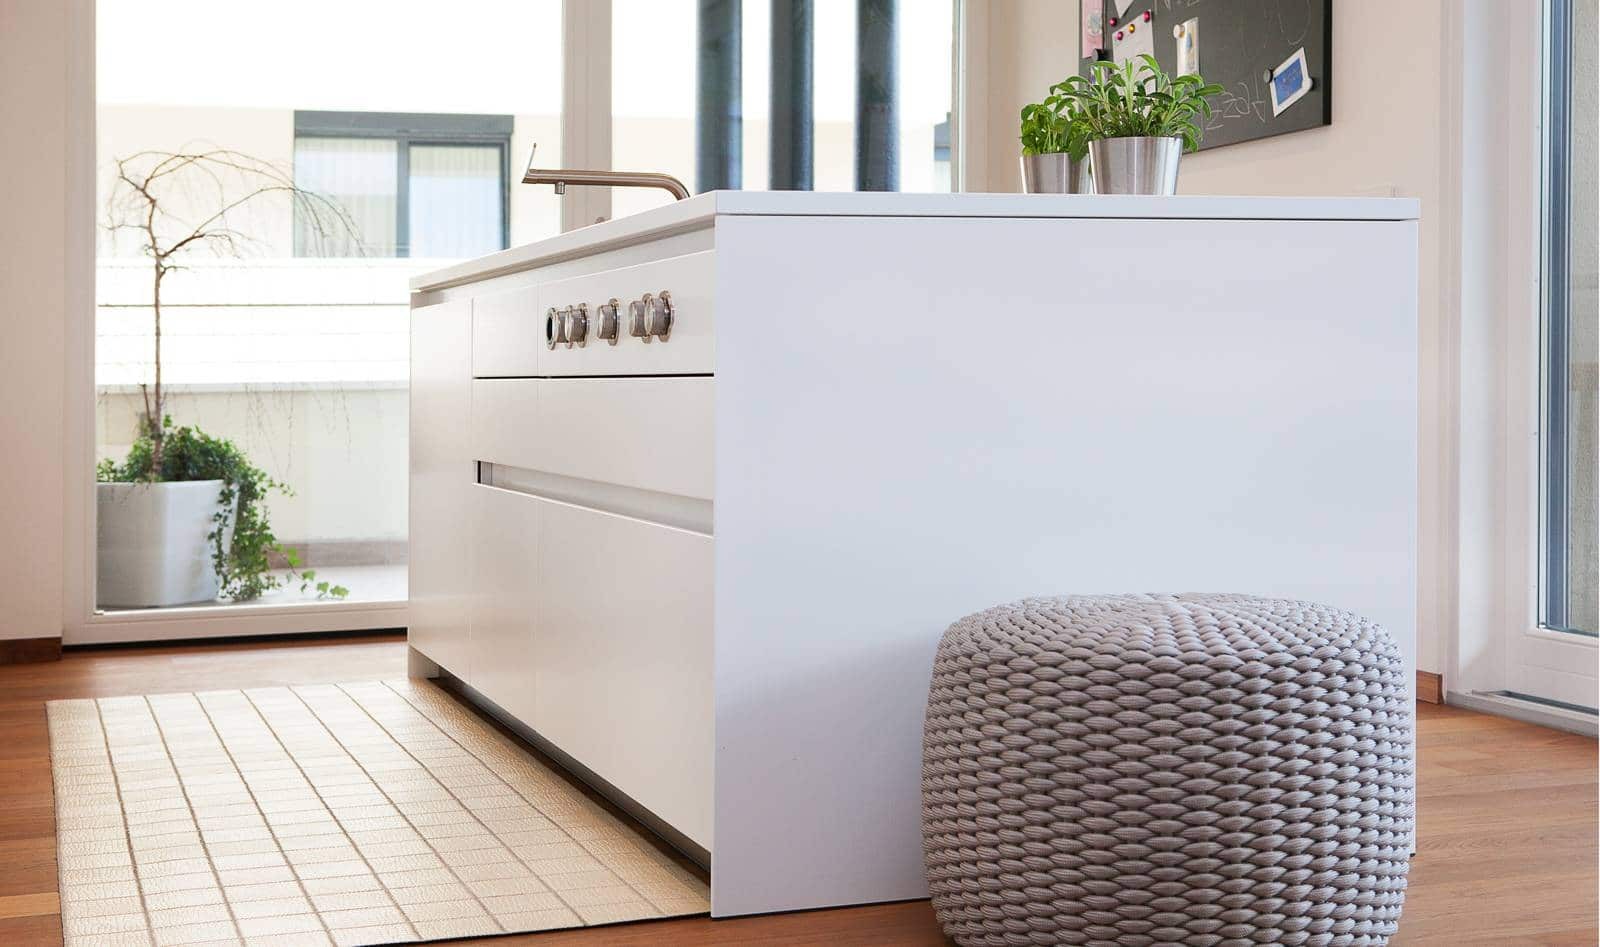 Dise o de isla de cocina construye hogar - Construye hogar ...